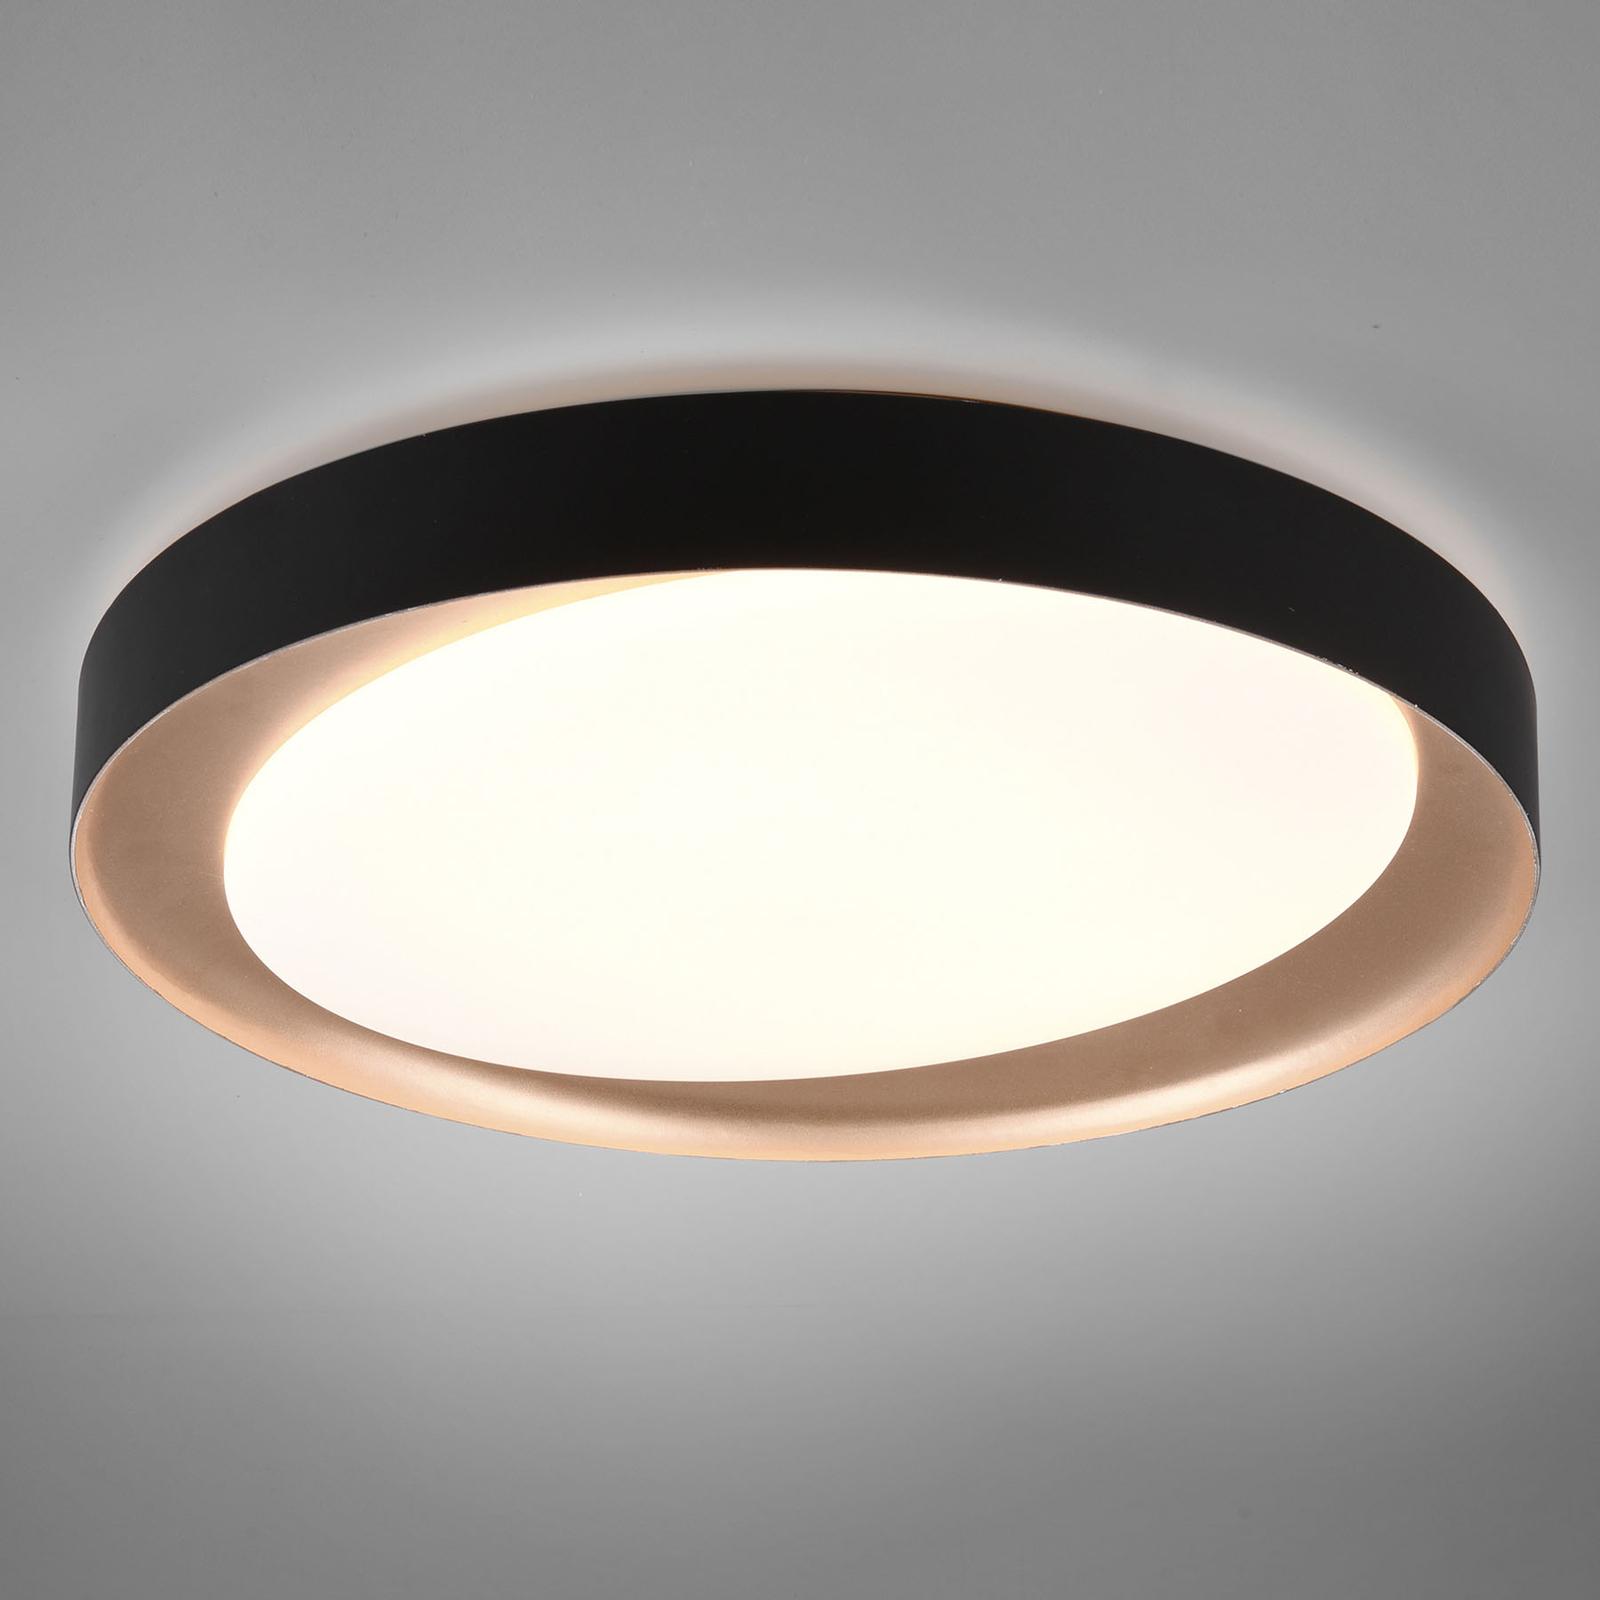 Plafonnier LED Zeta tunable white, noir/doré